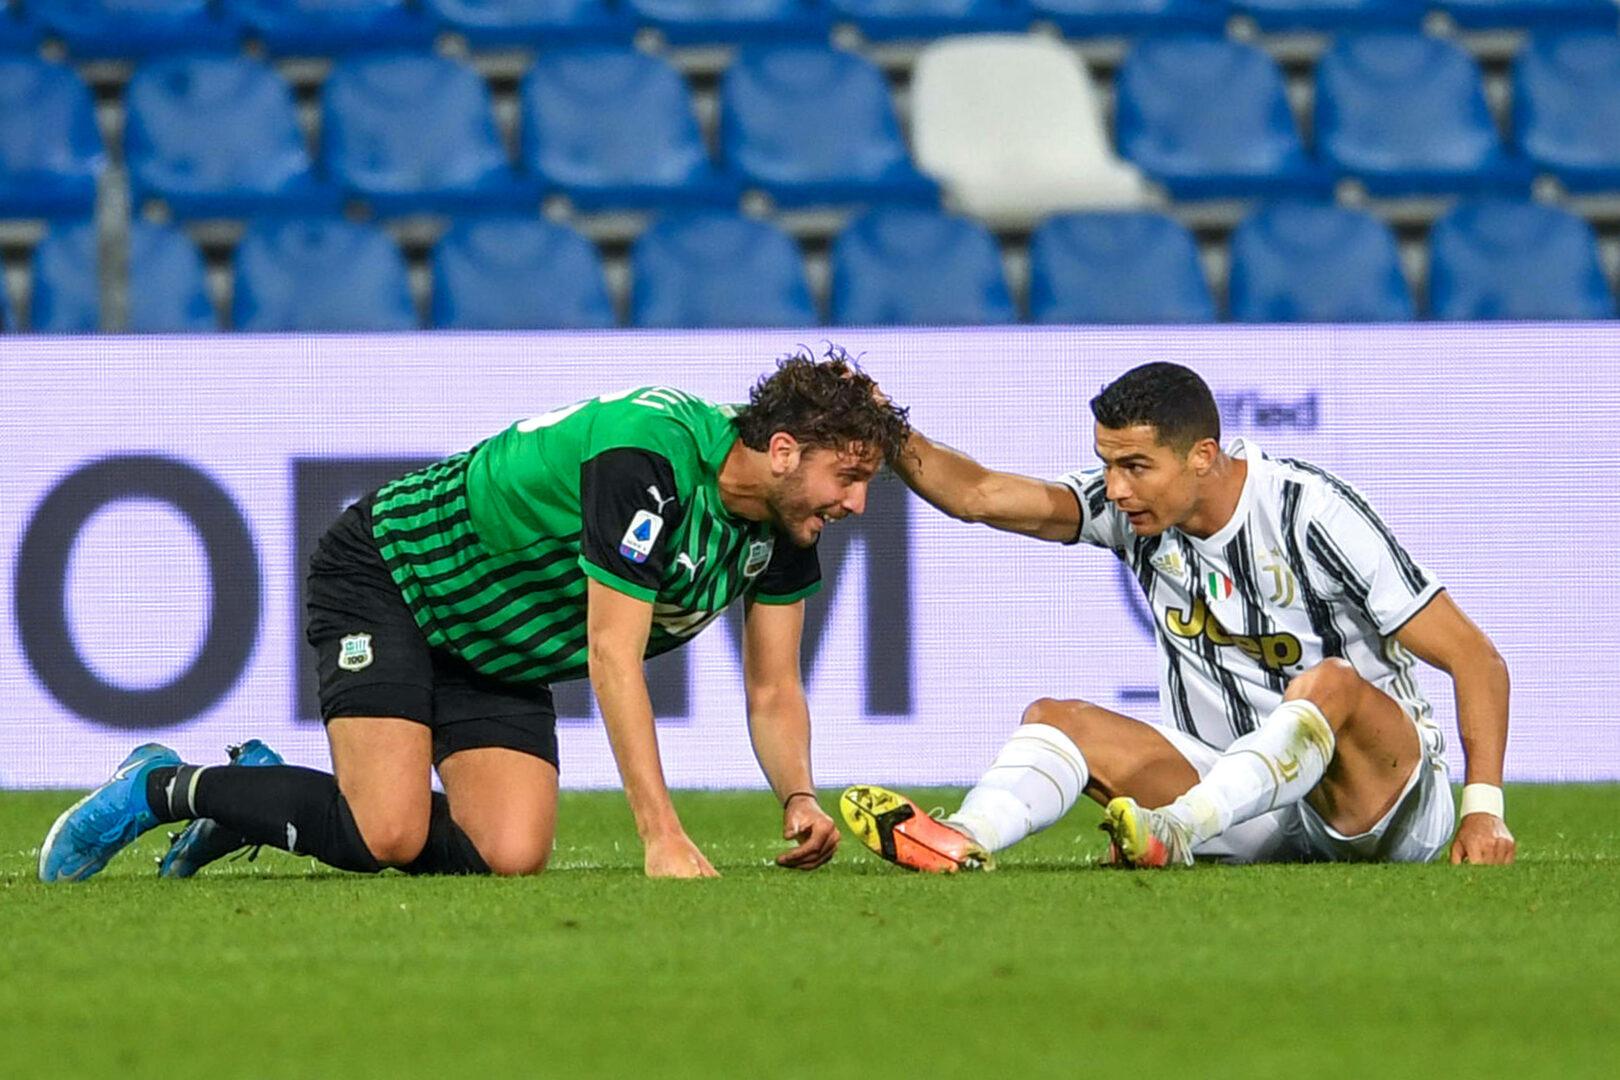 Manuel Locatelli (Sassuolo)Cristiano Ronaldo (Juventus) Zweikampf